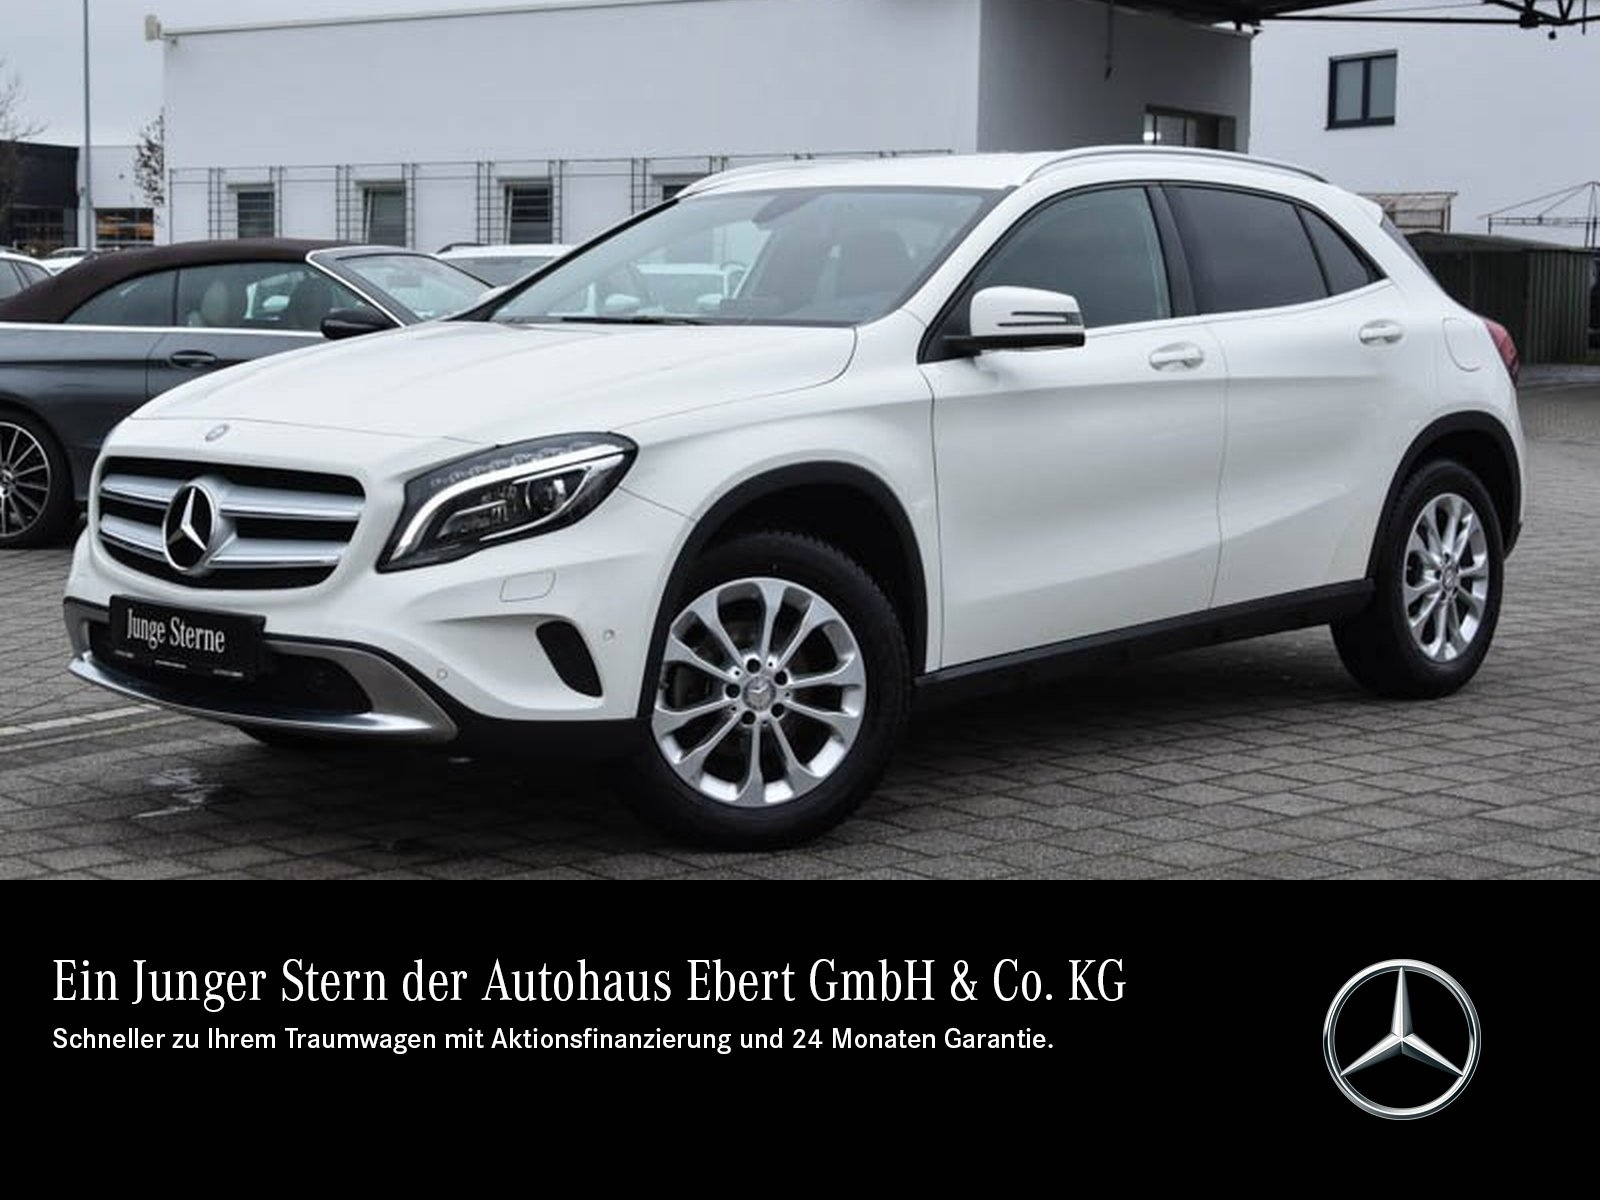 Mercedes-Benz GLA 220 d Urban 7G-DCT+NAVI+AHK+ILS+LEDER+EU6, Jahr 2015, Diesel